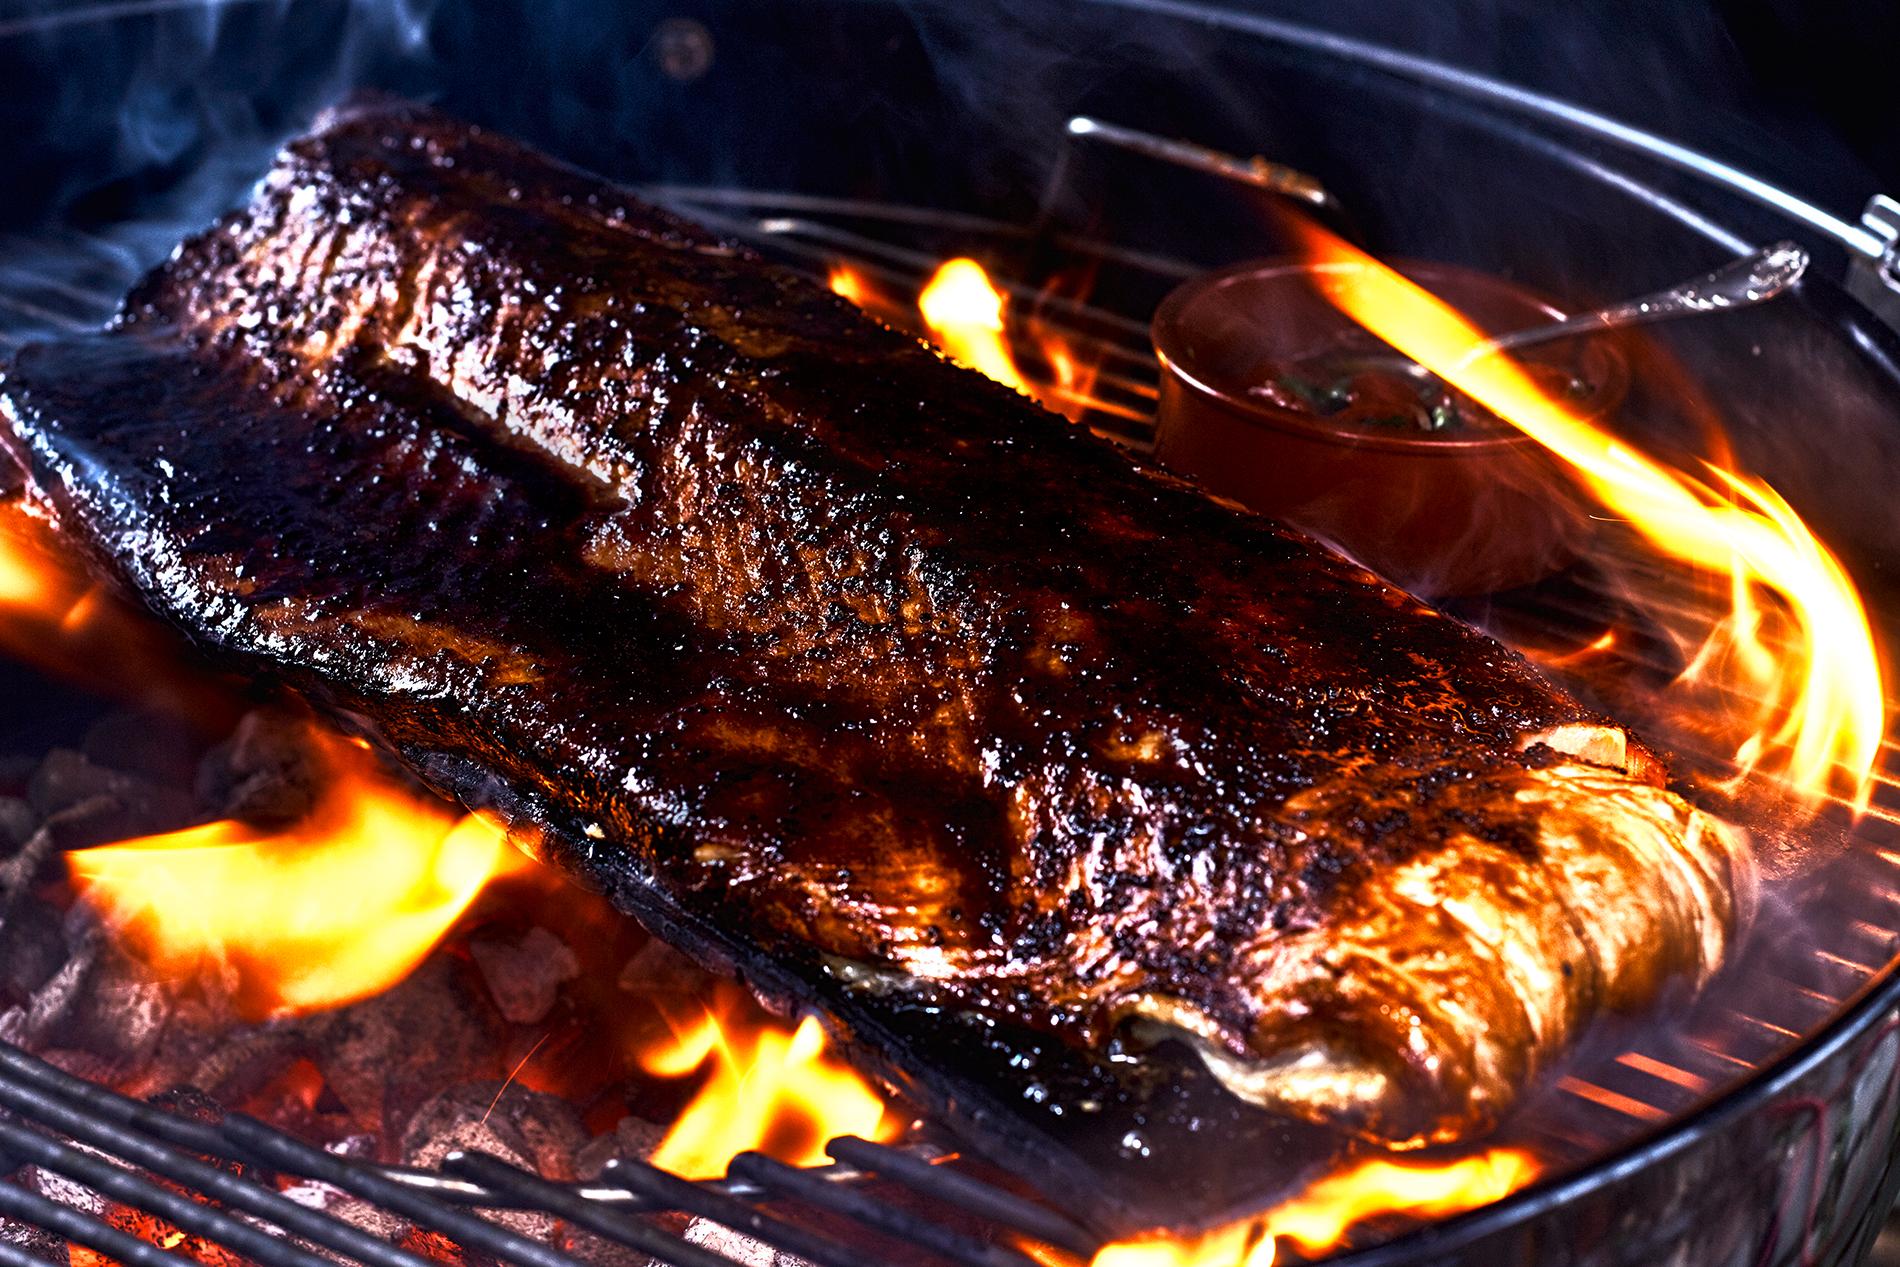 Lachs auf Zedernholz gegrillt - Grill-Kochkurs